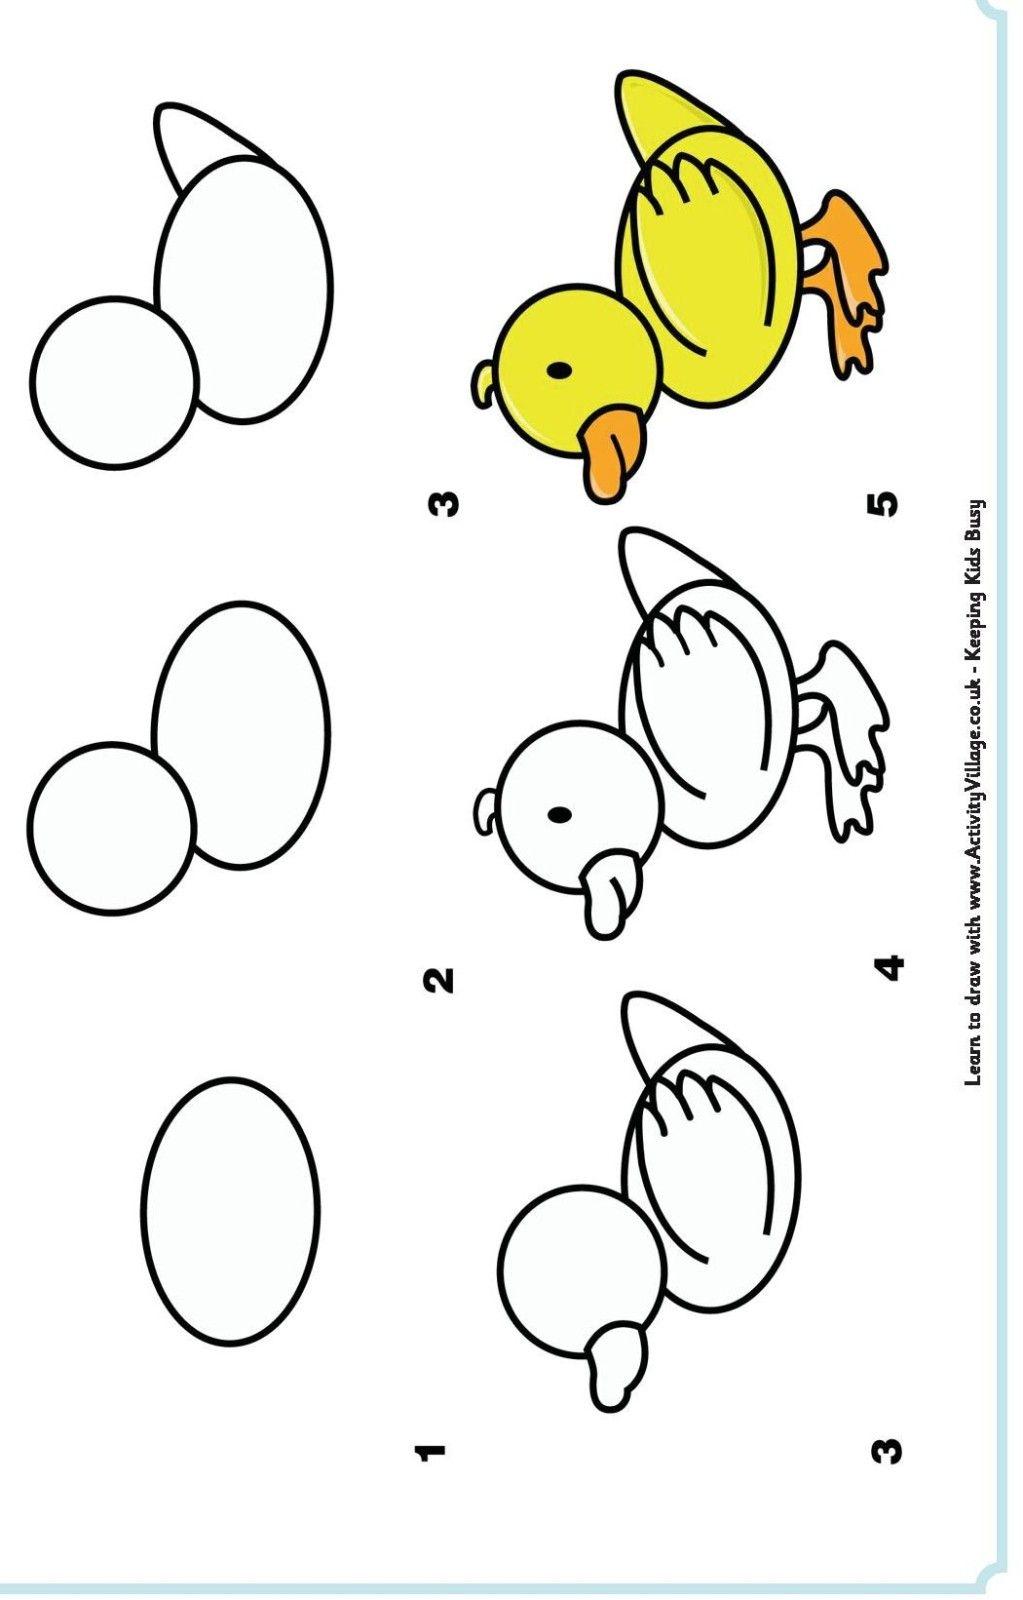 Image Apprendre A Dessiner De Suneeta Singh Du Tableau Easy Animal